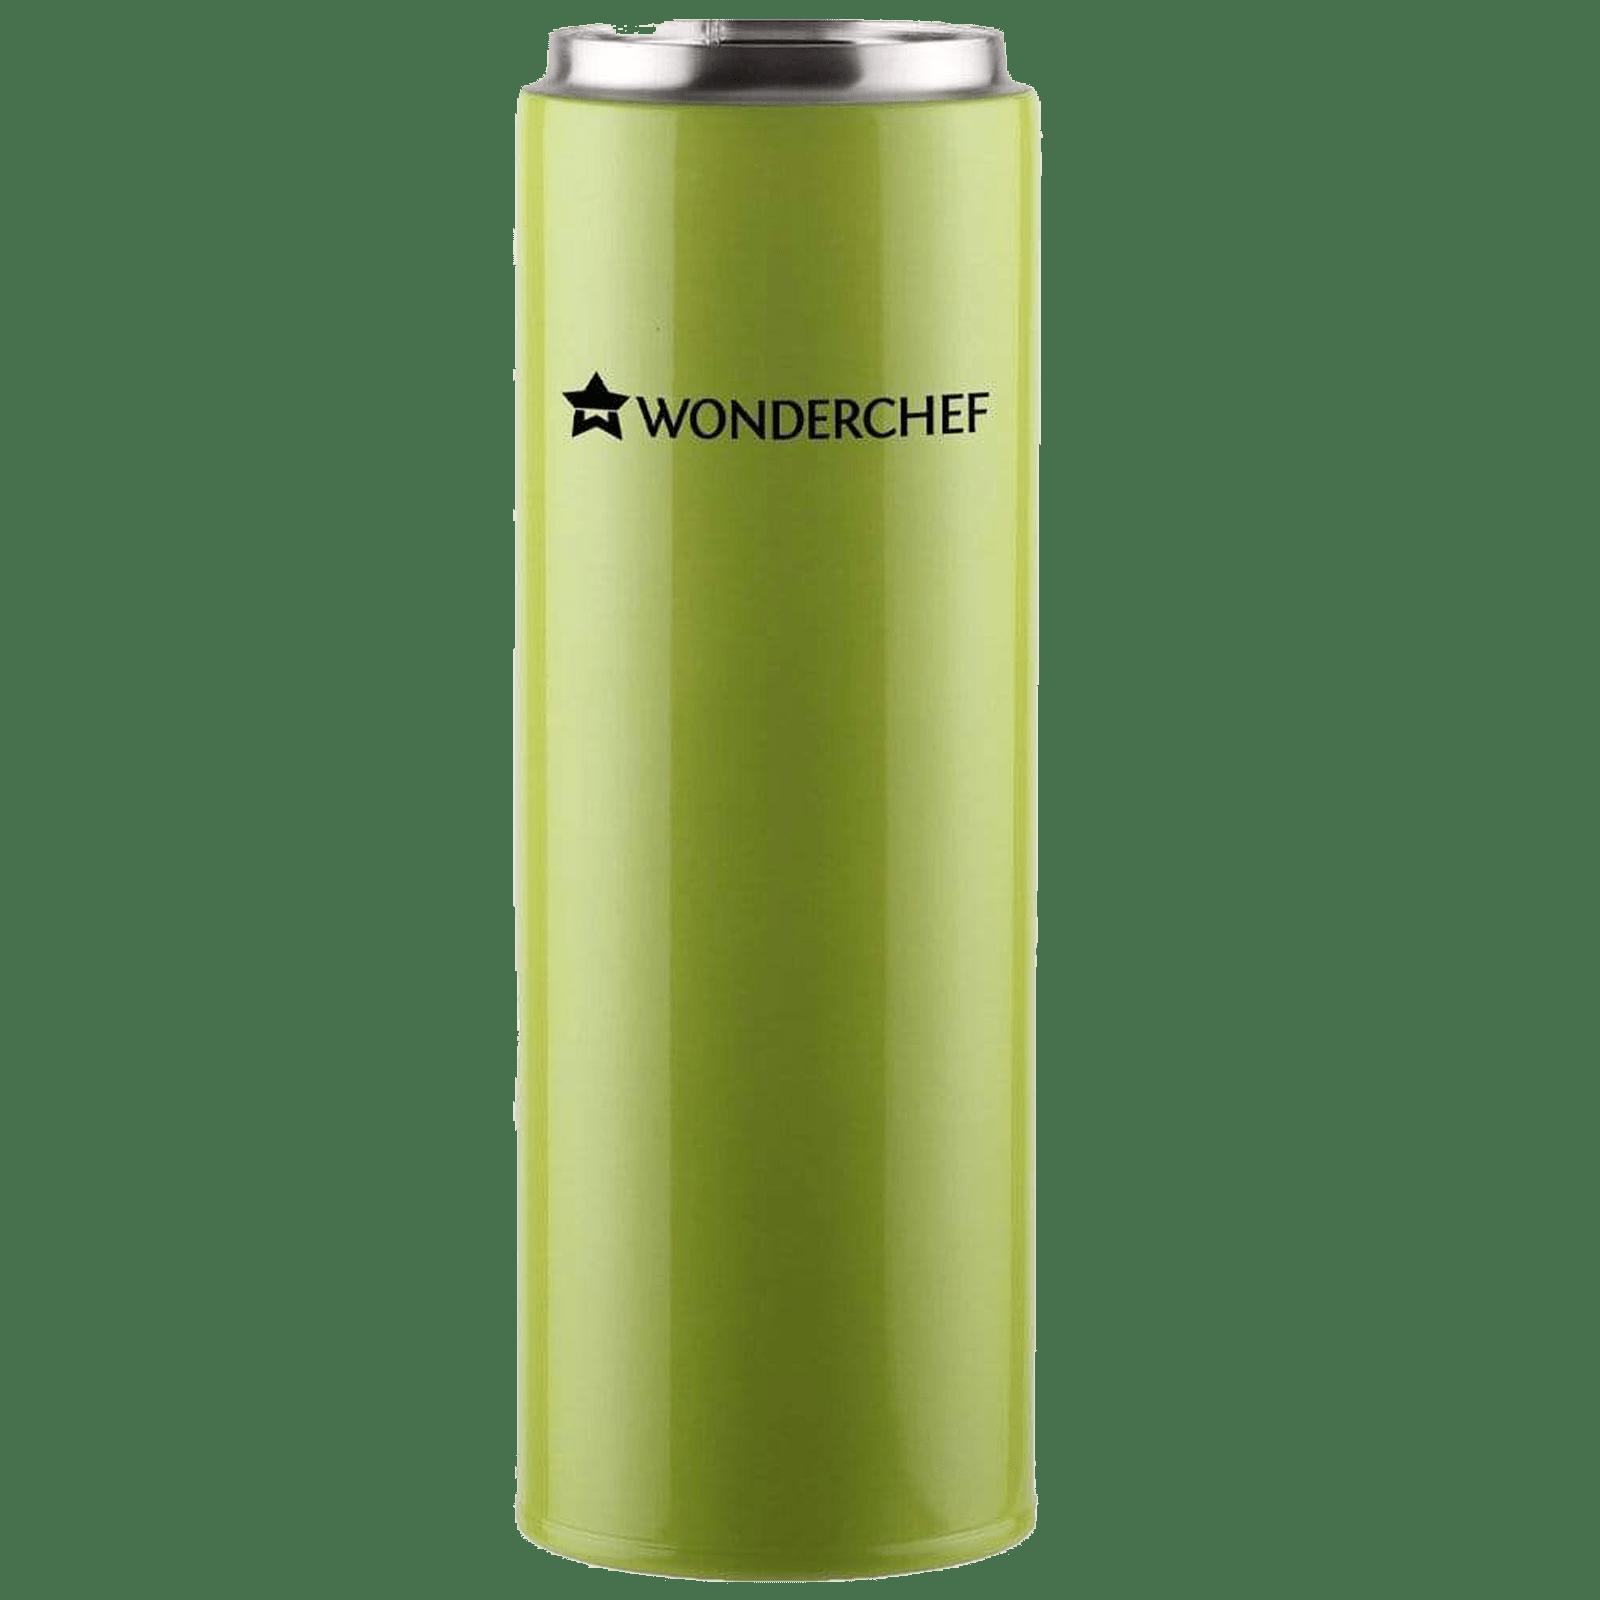 Wonderchef Uni-Bot 0.5 Litres Stainless Steel Water Bottle (Vacuum Insulation, 63152741, Apple Green)